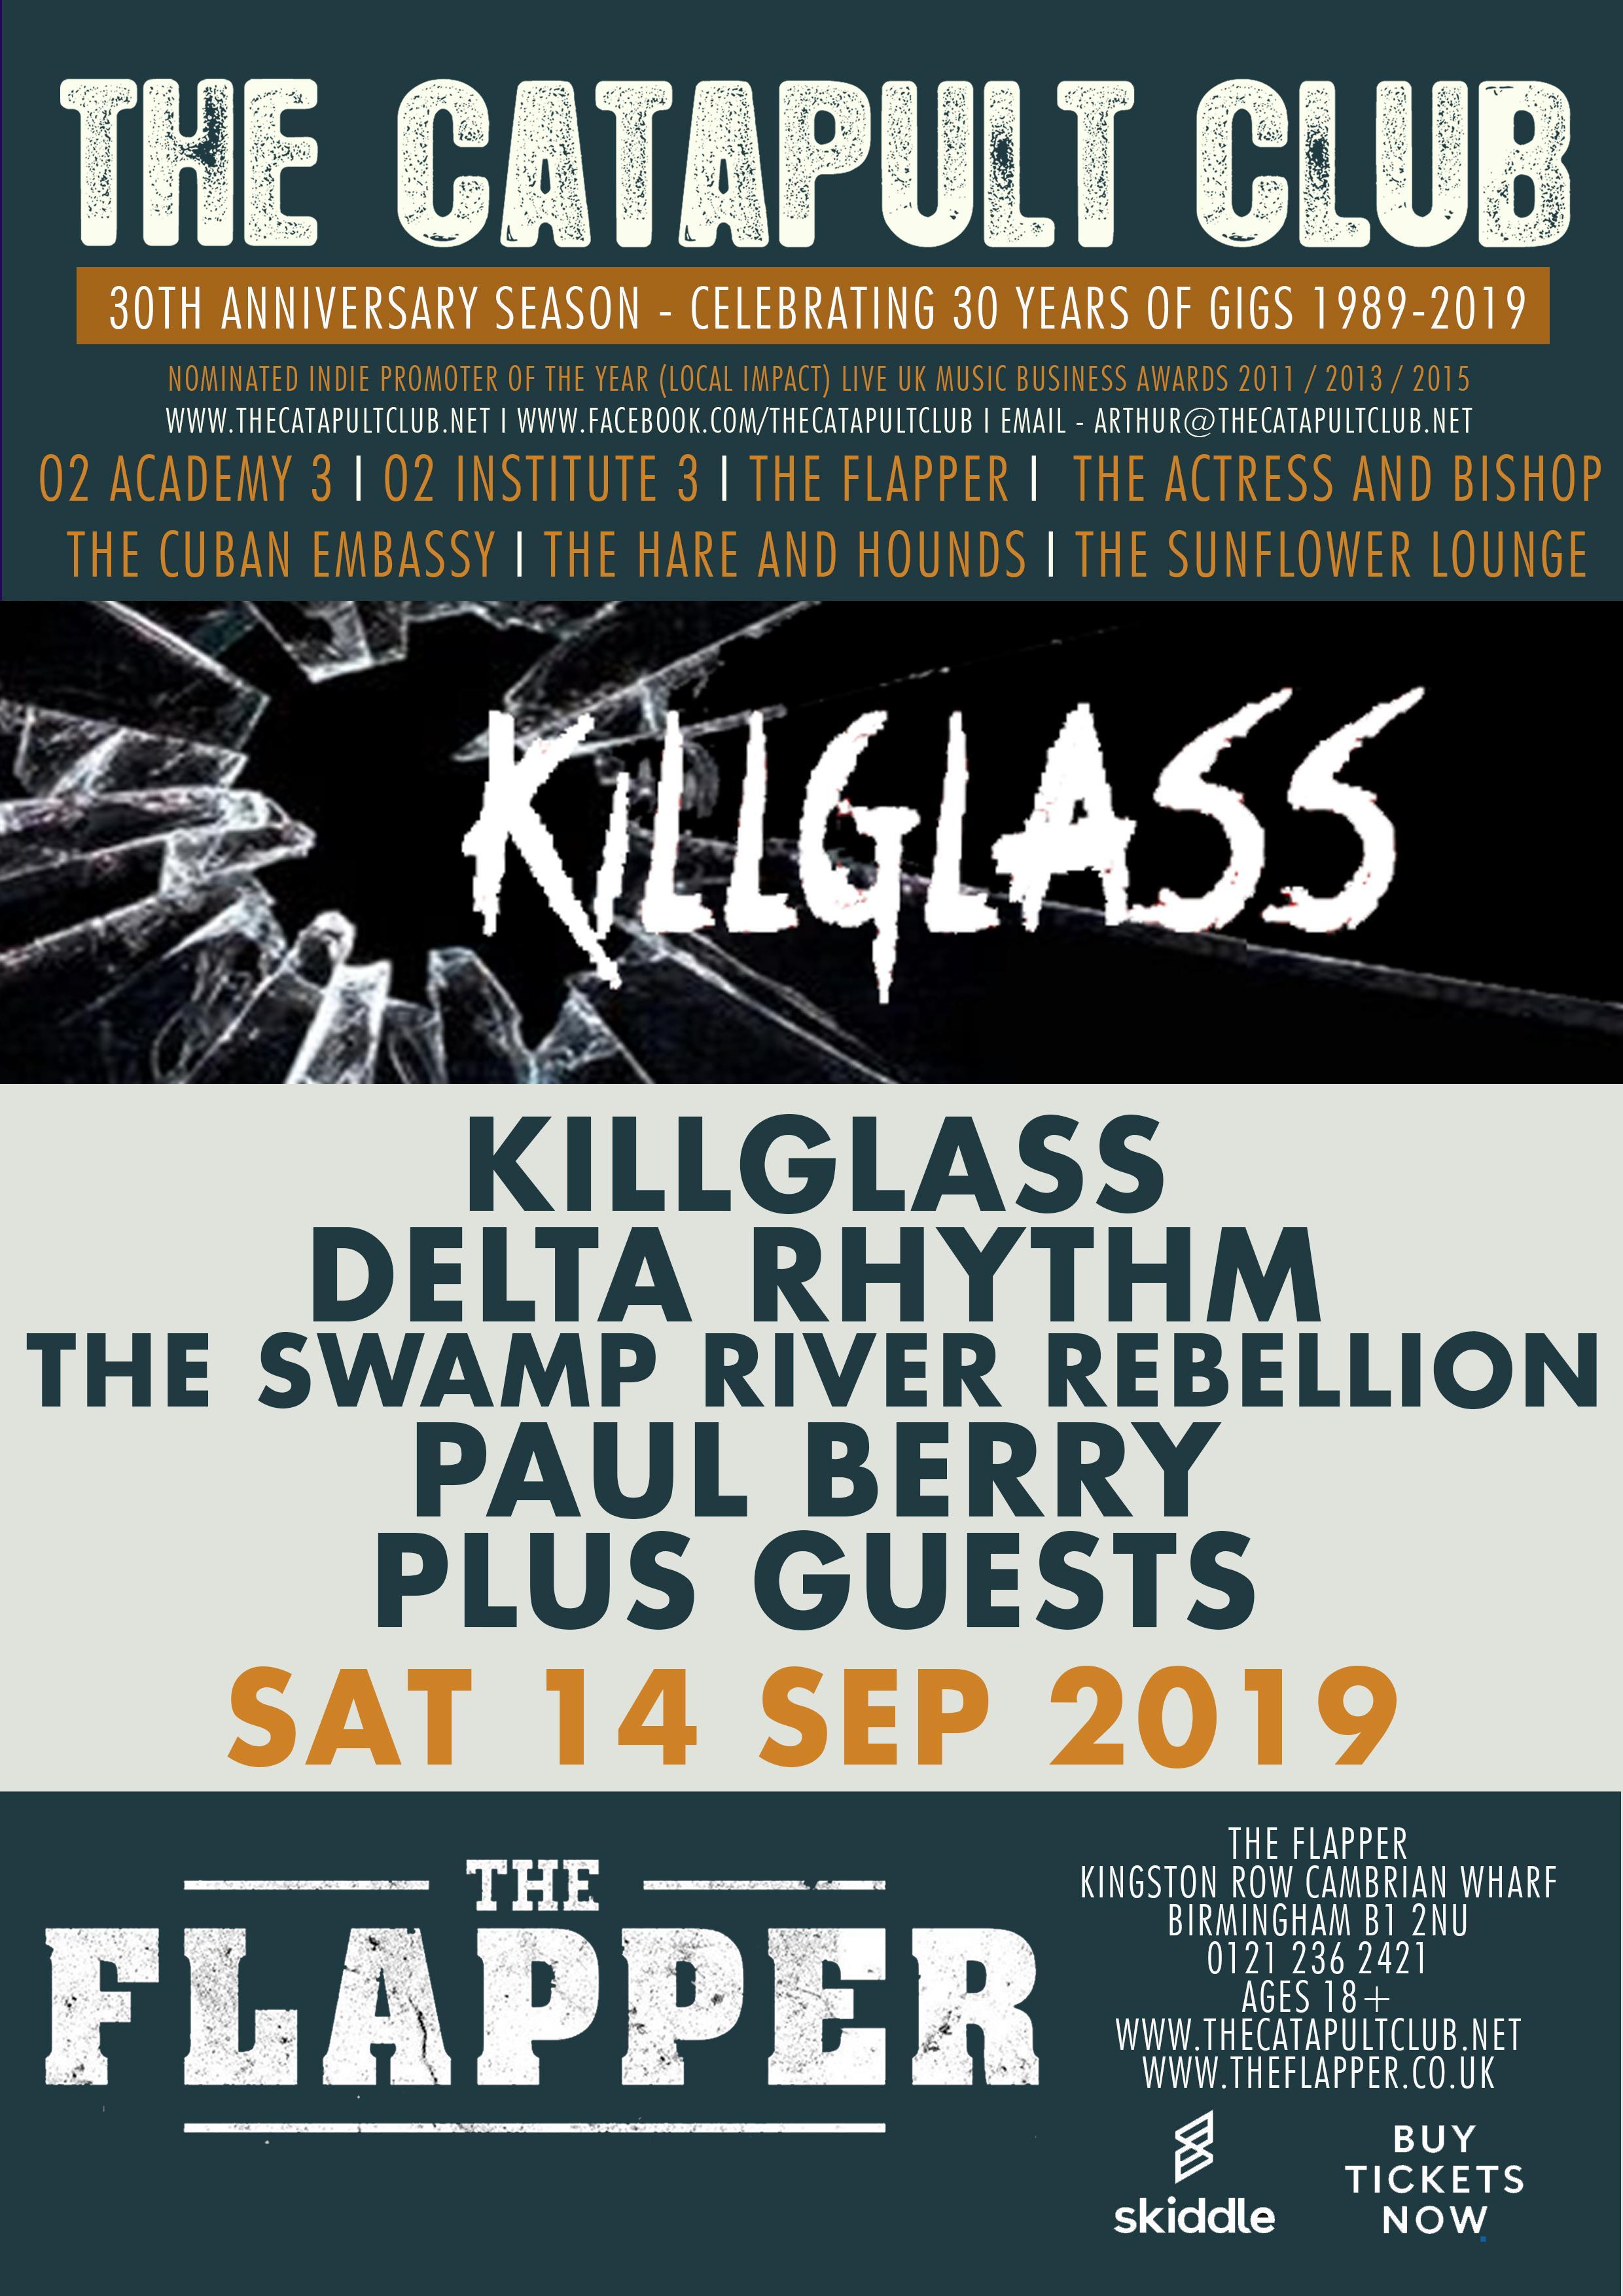 KillGlass / Delta Rhythm / Swamp River Rebellion / Paul Berry at The Flapper